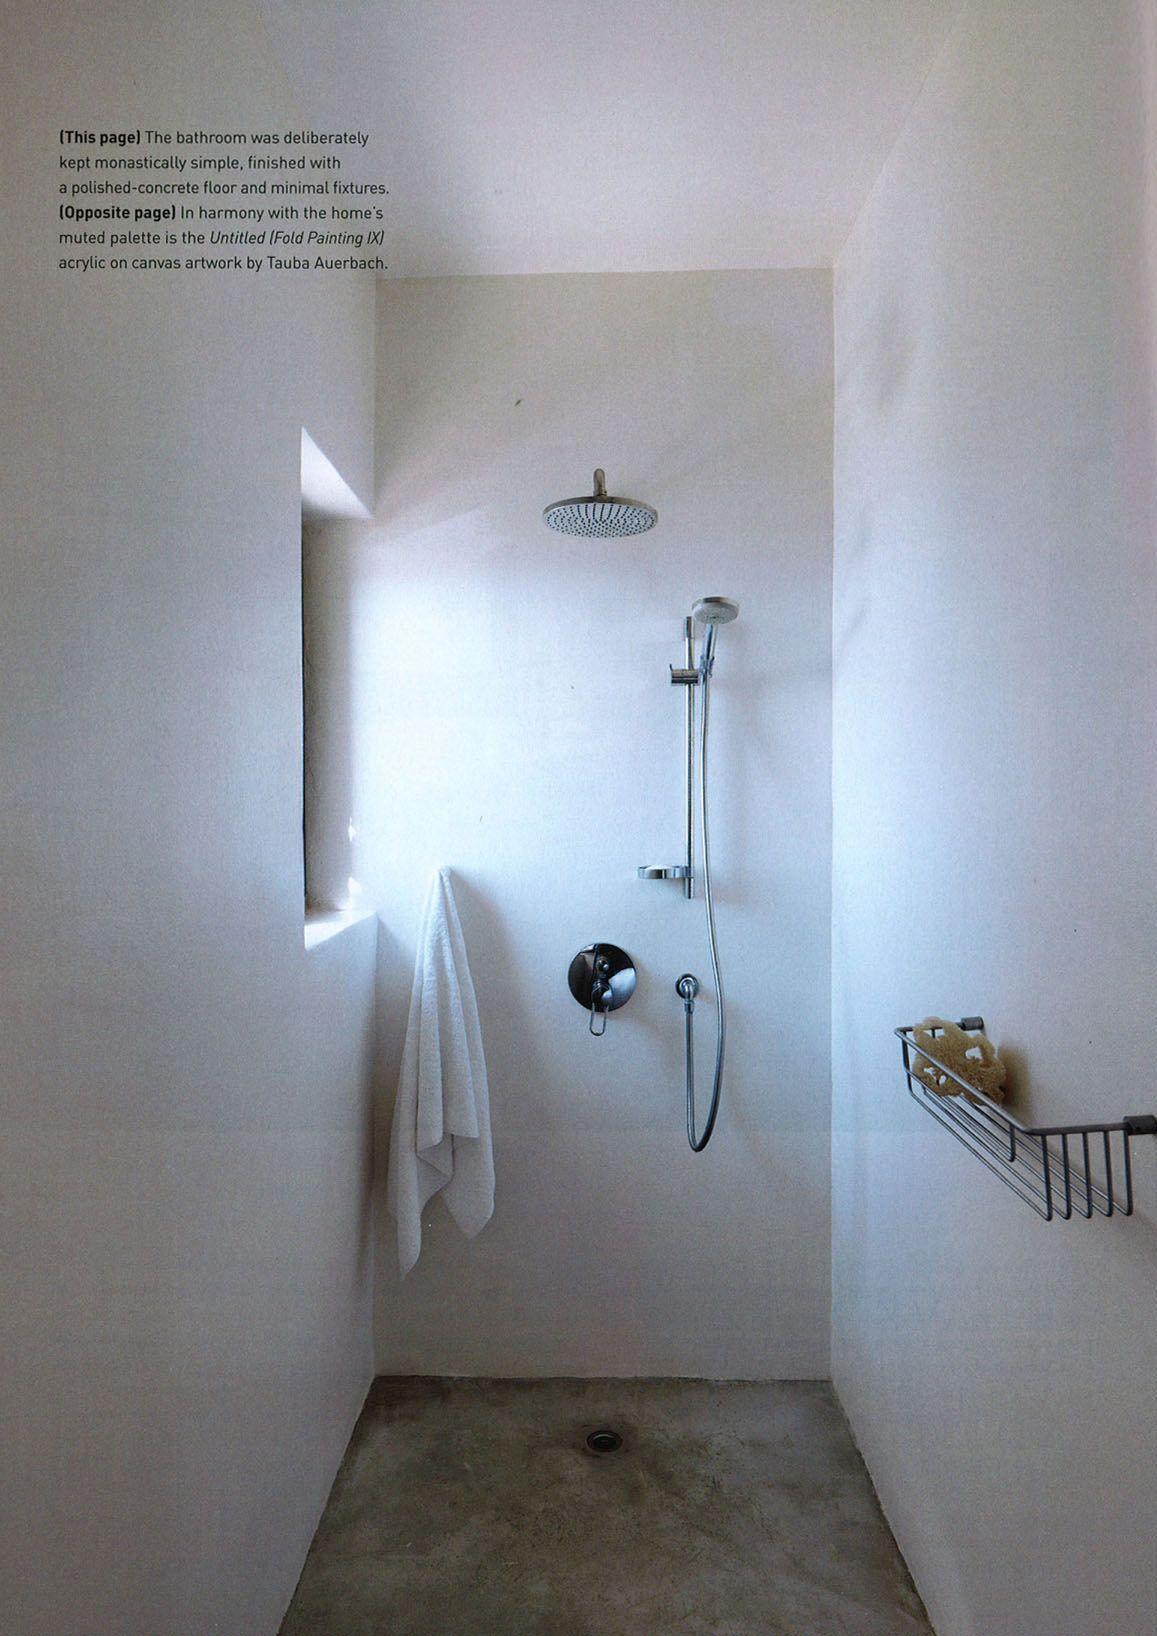 Wet Room | Shower/bath | Pinterest | Wet rooms, Room and Sauna shower